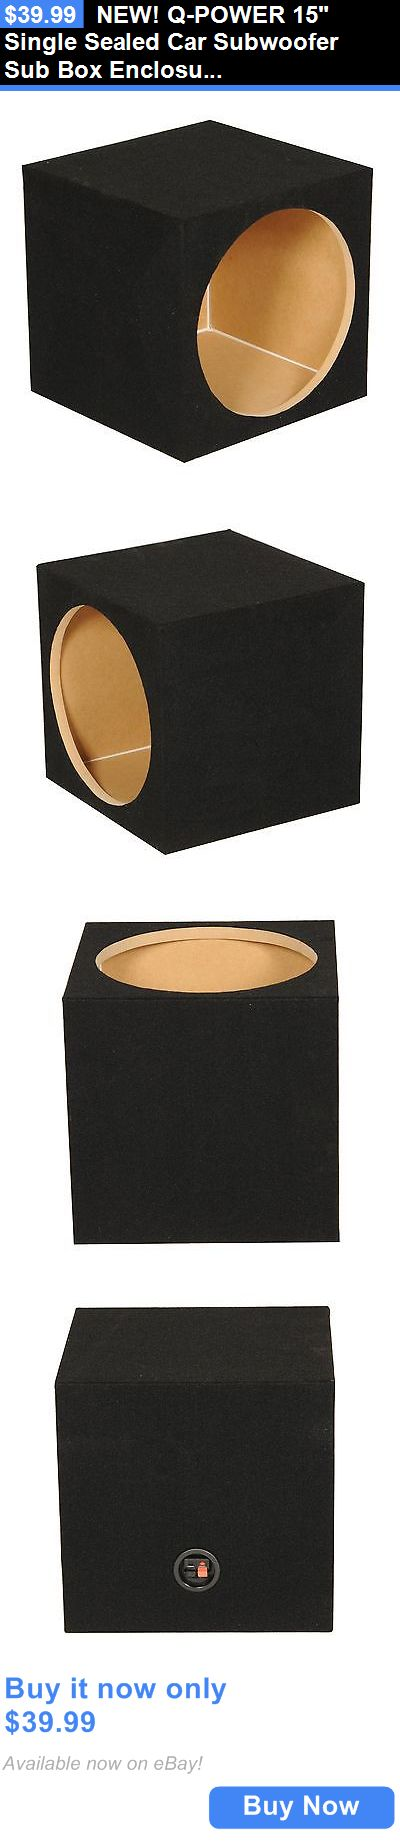 Speaker Sub Enclosures: New! Q-Power 15 Single Sealed Car Subwoofer Sub Box Enclosure|16.5 X 16.25 X 13 BUY IT NOW ONLY: $39.99